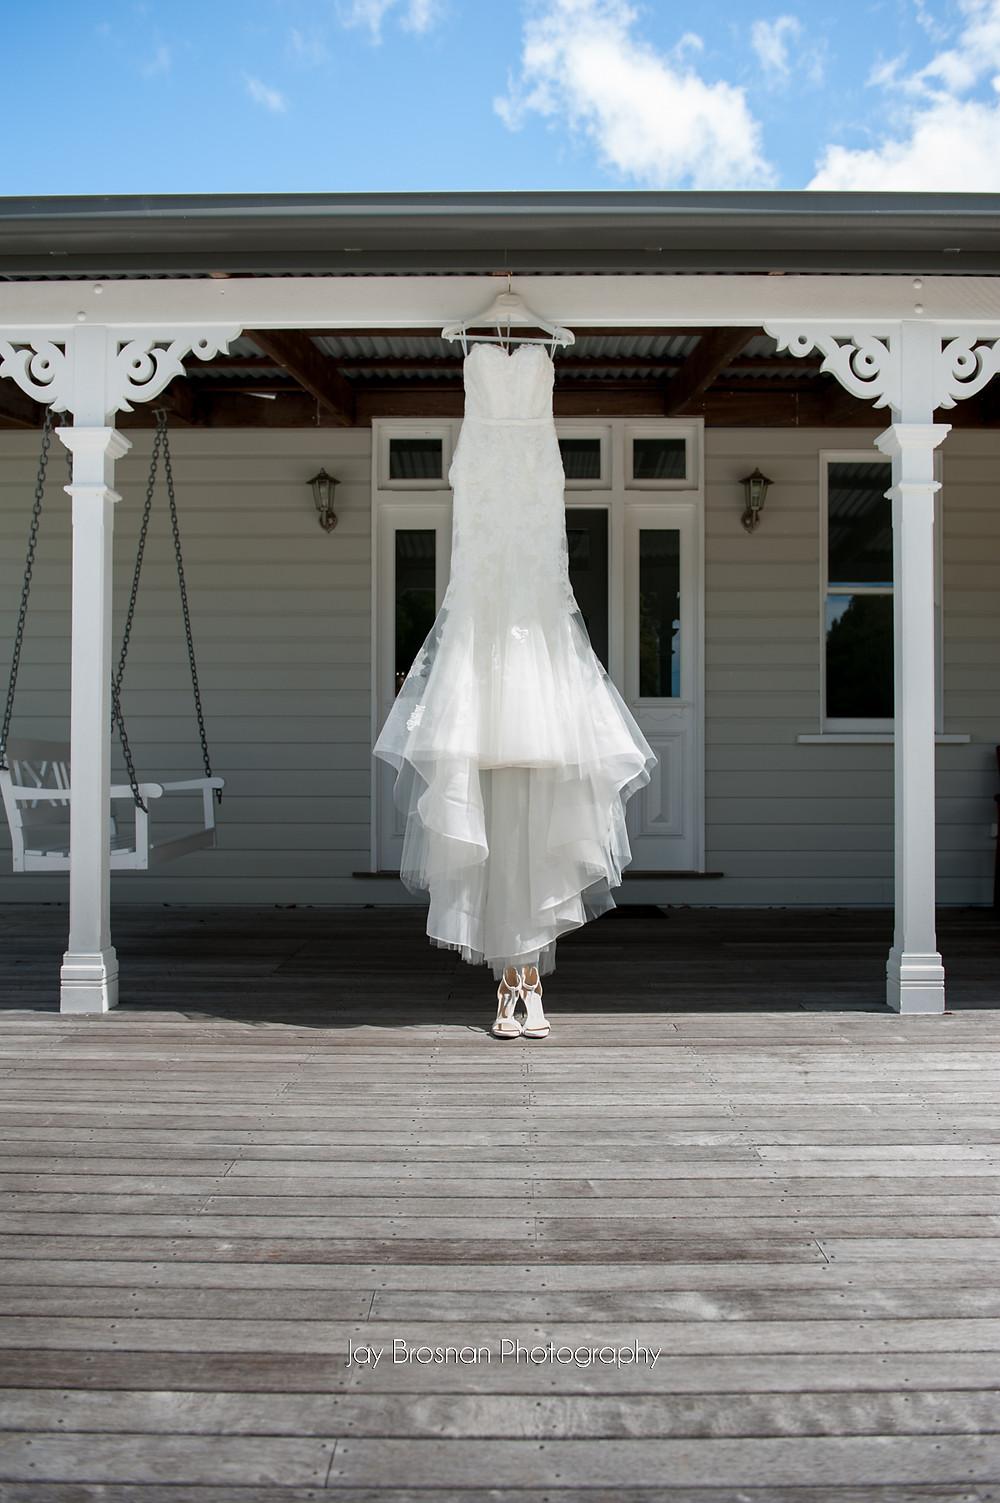 Jay Brosnan Photography | Sunshine Coast Wedding Photographer | Brisbane Wedding Photographer | Wedding Photographer | Portrait Photographer | Engagement Photographer | Wedding | Photographer